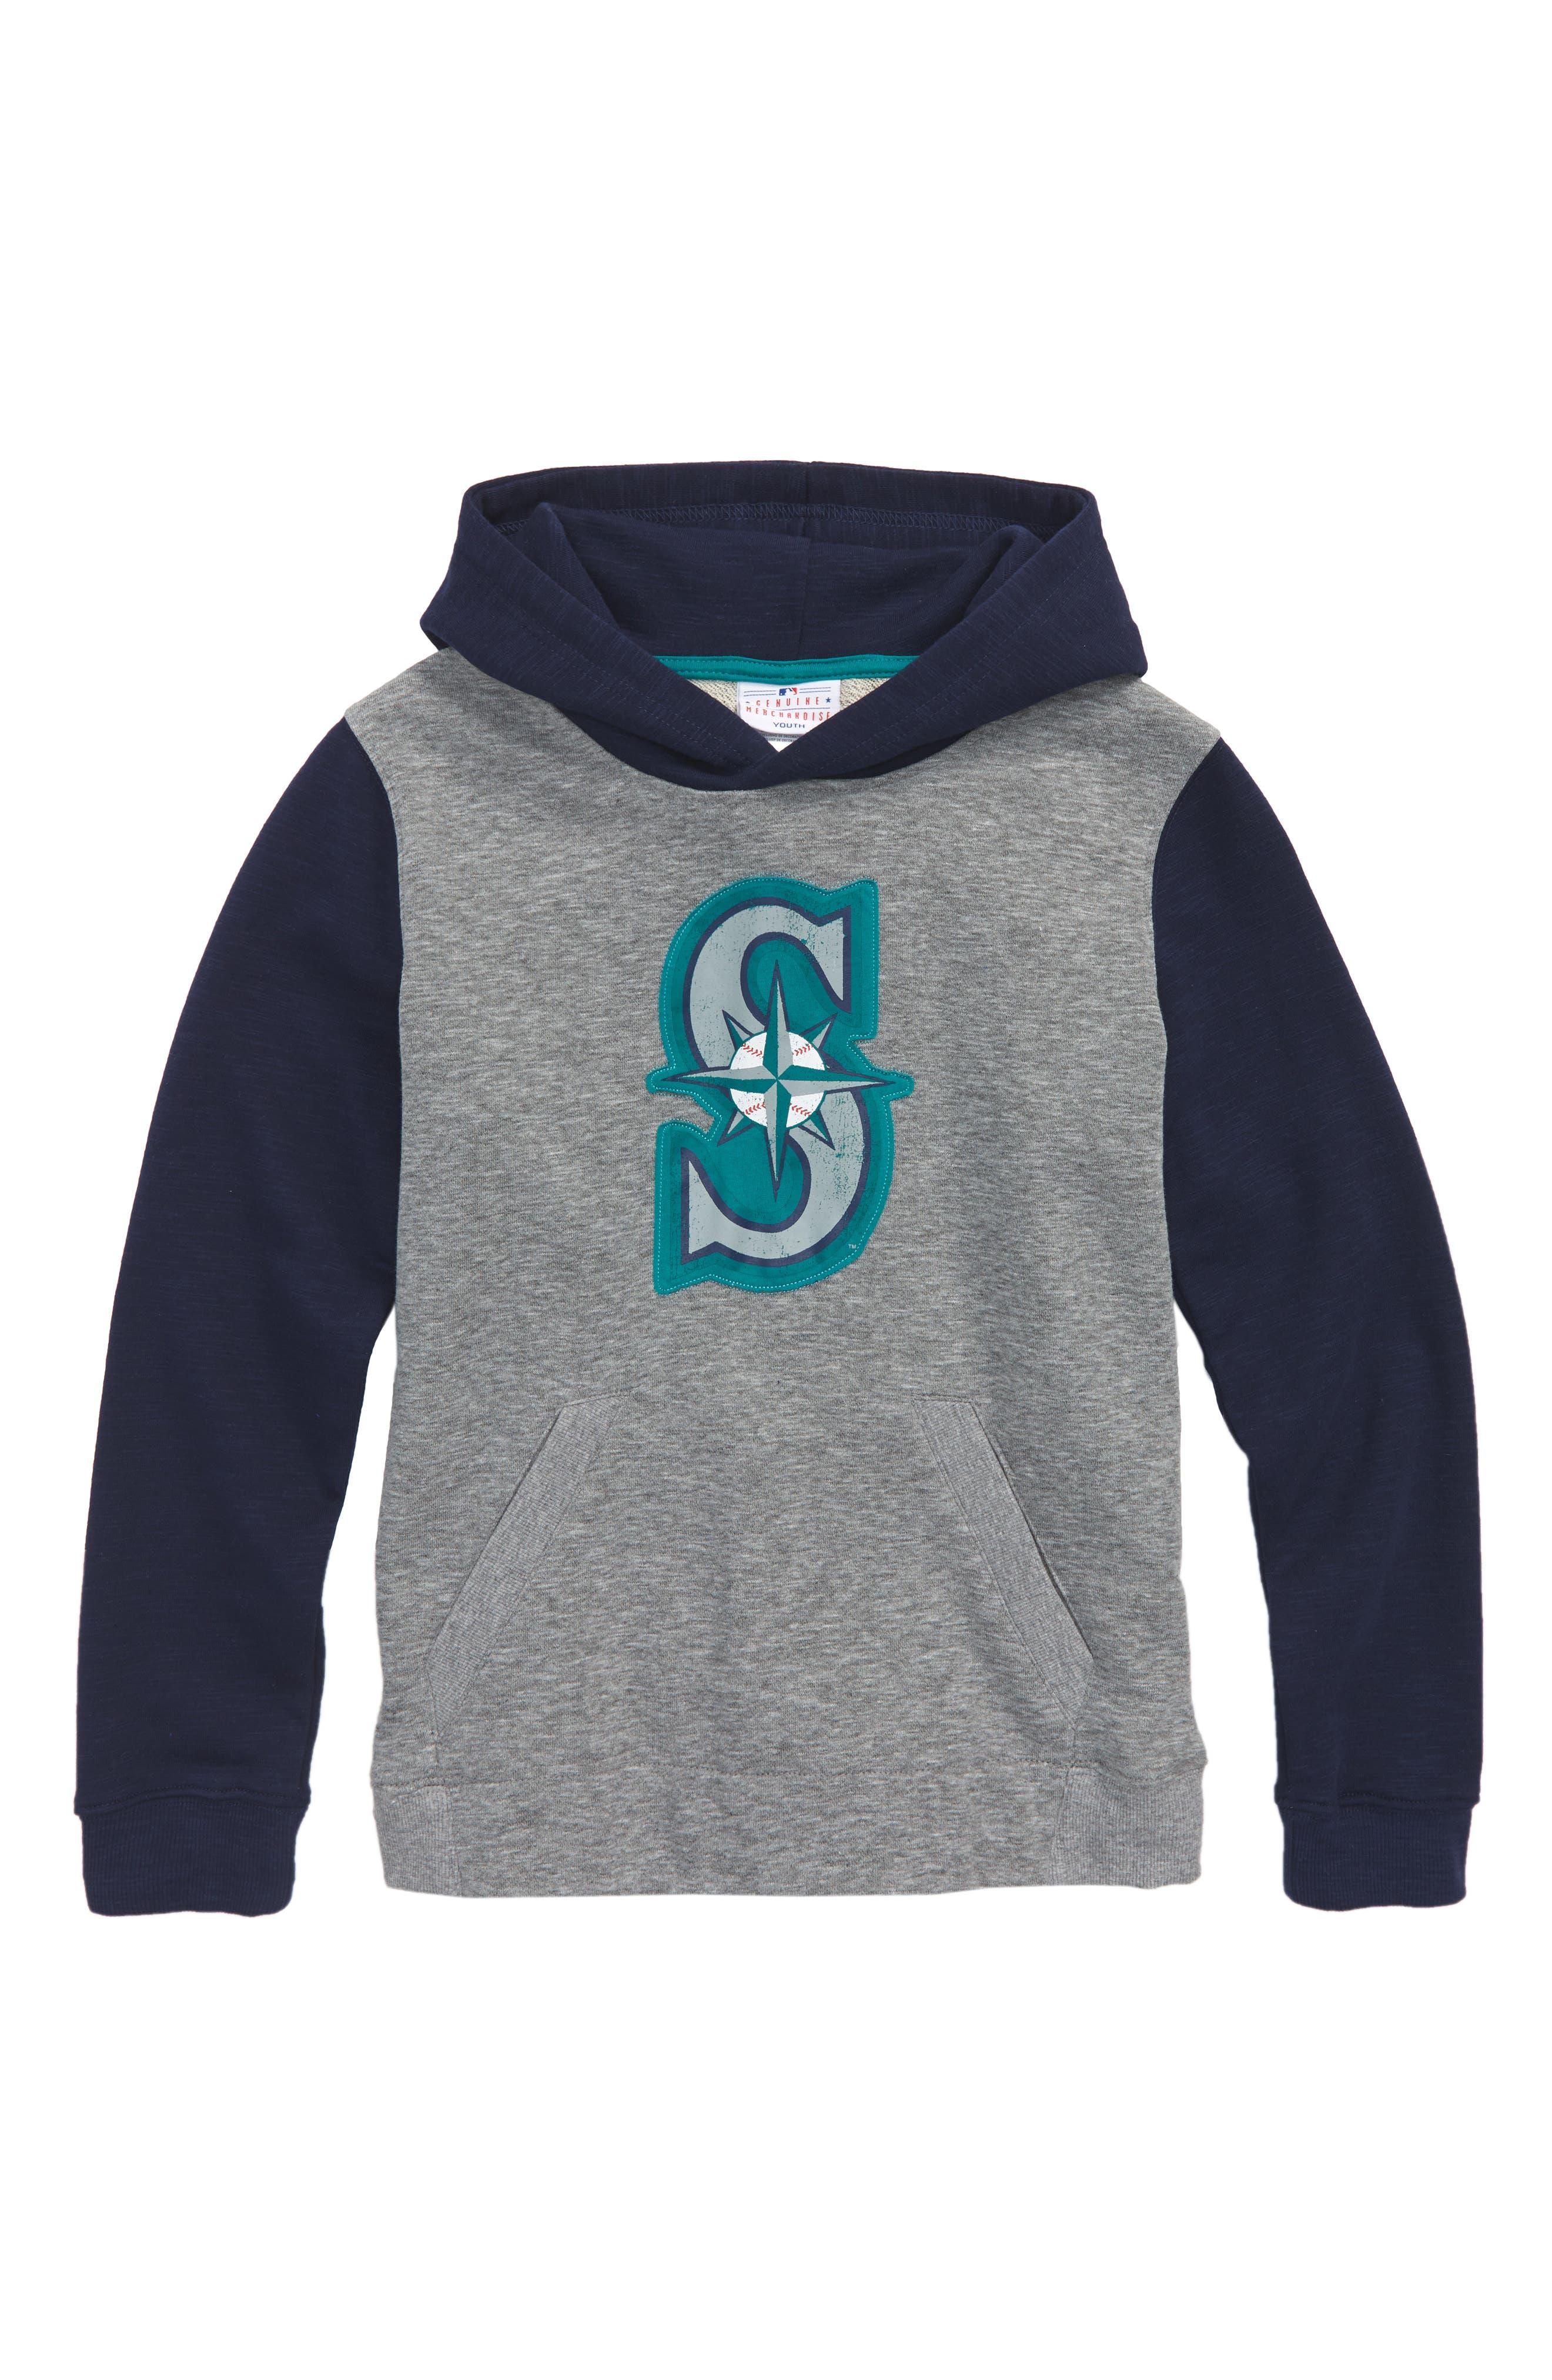 New Beginnings - Seattle Mariners Pullover Hoodie,                         Main,                         color,